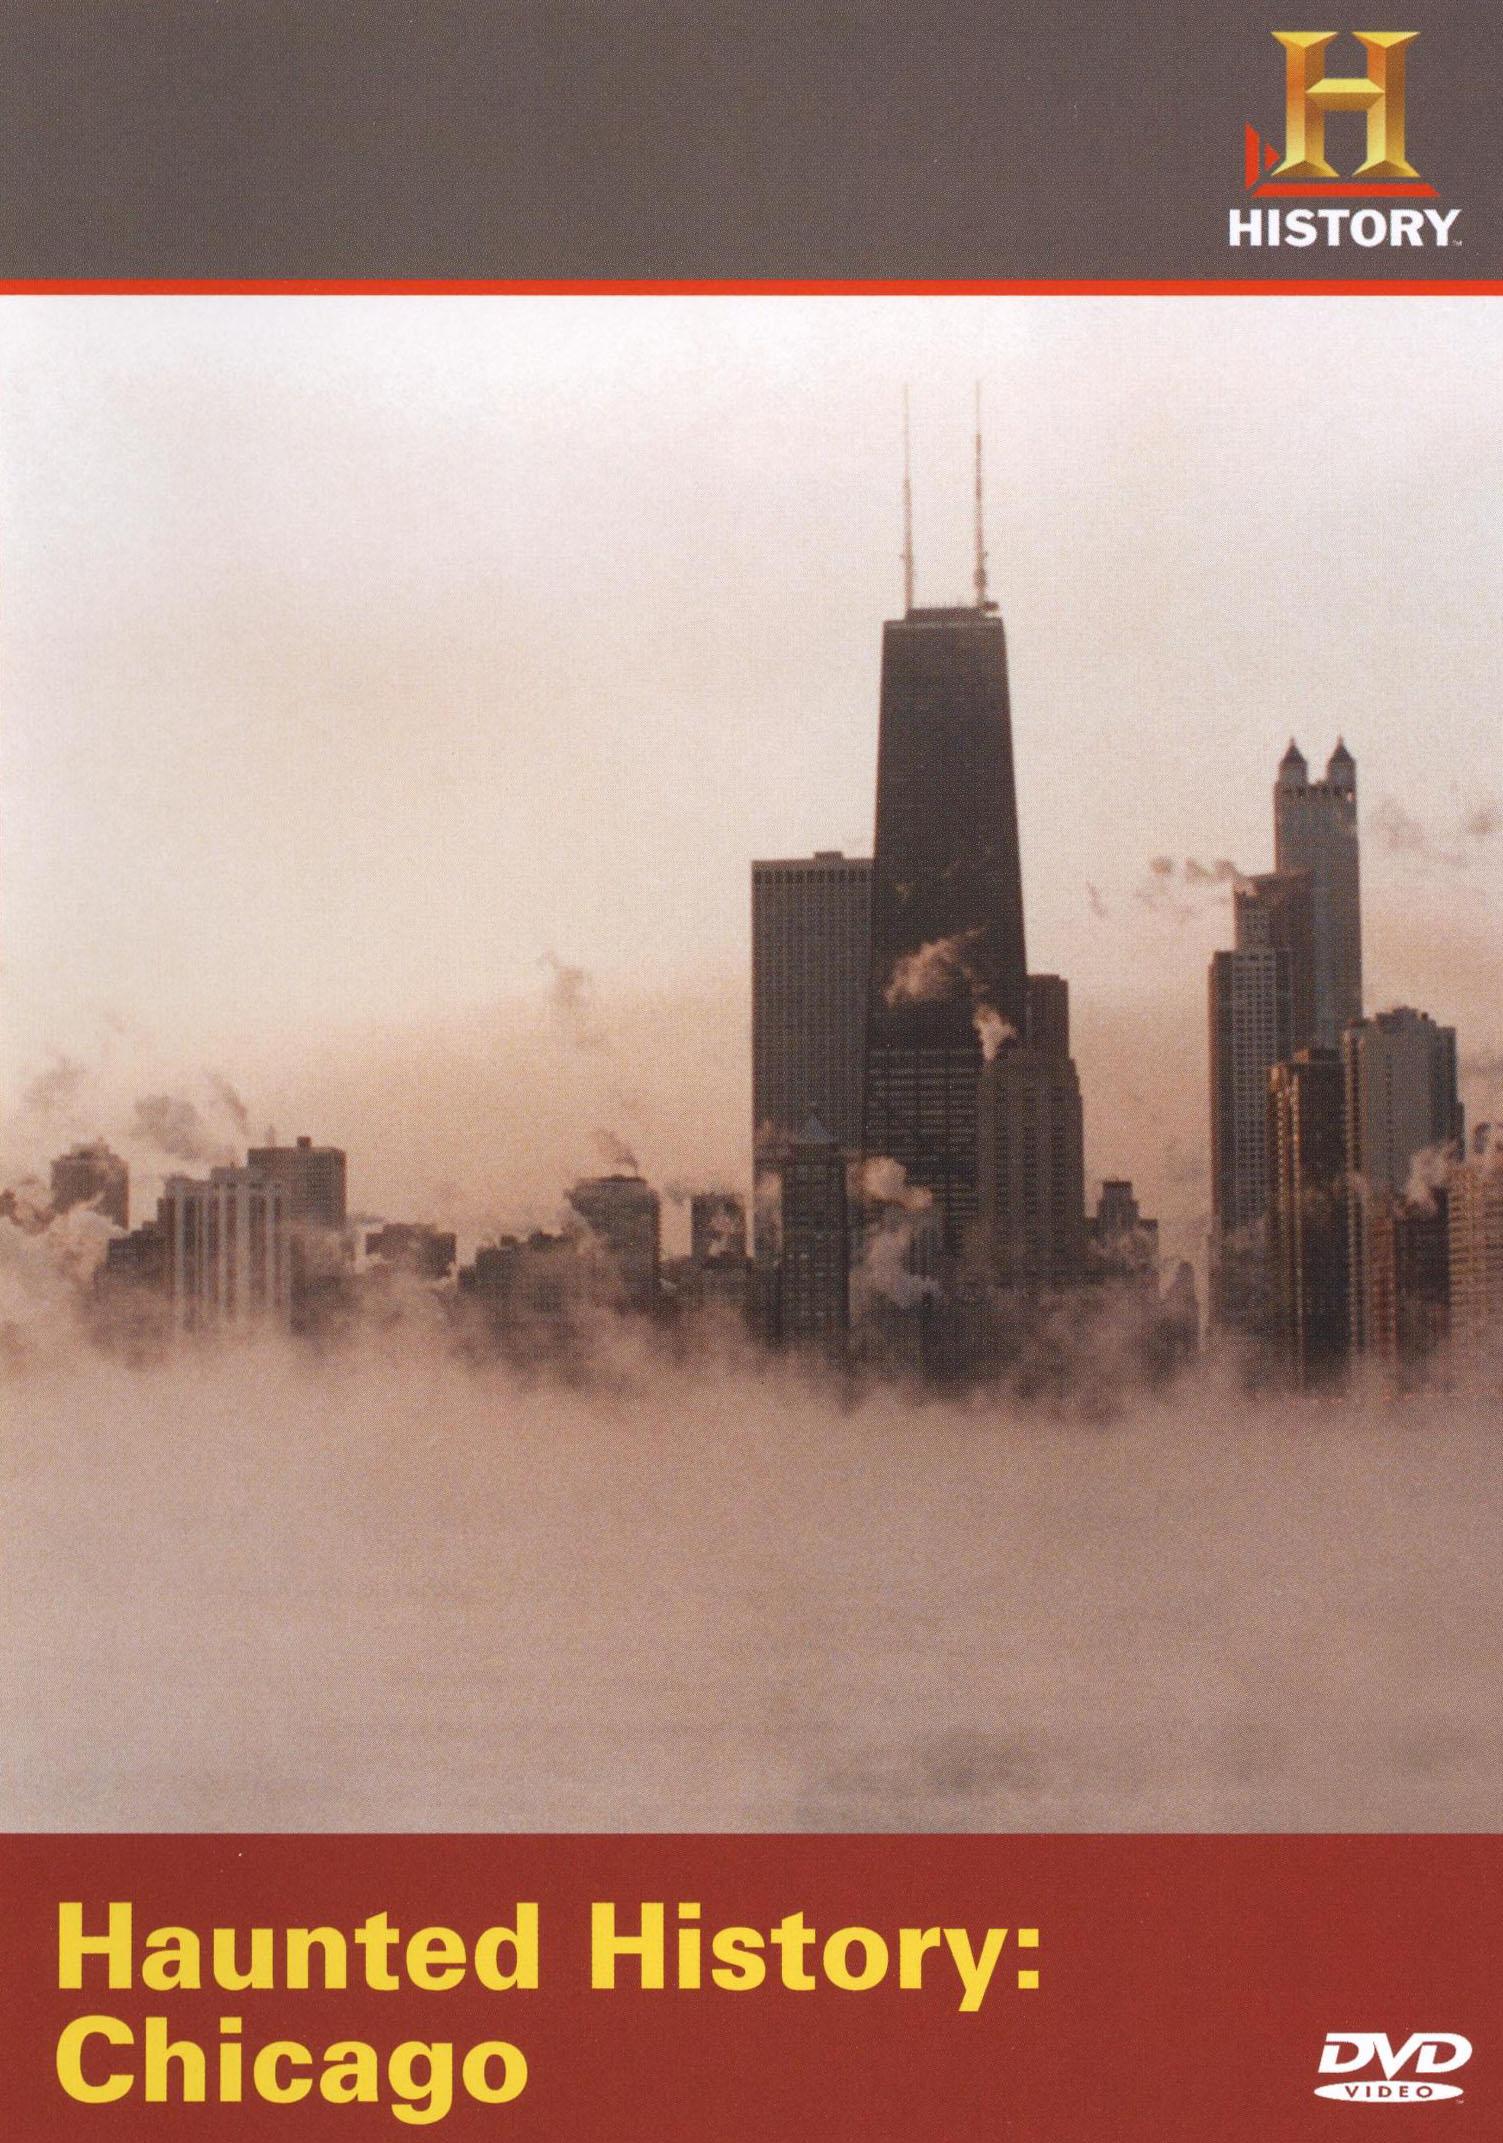 Haunted History: Haunted Chicago